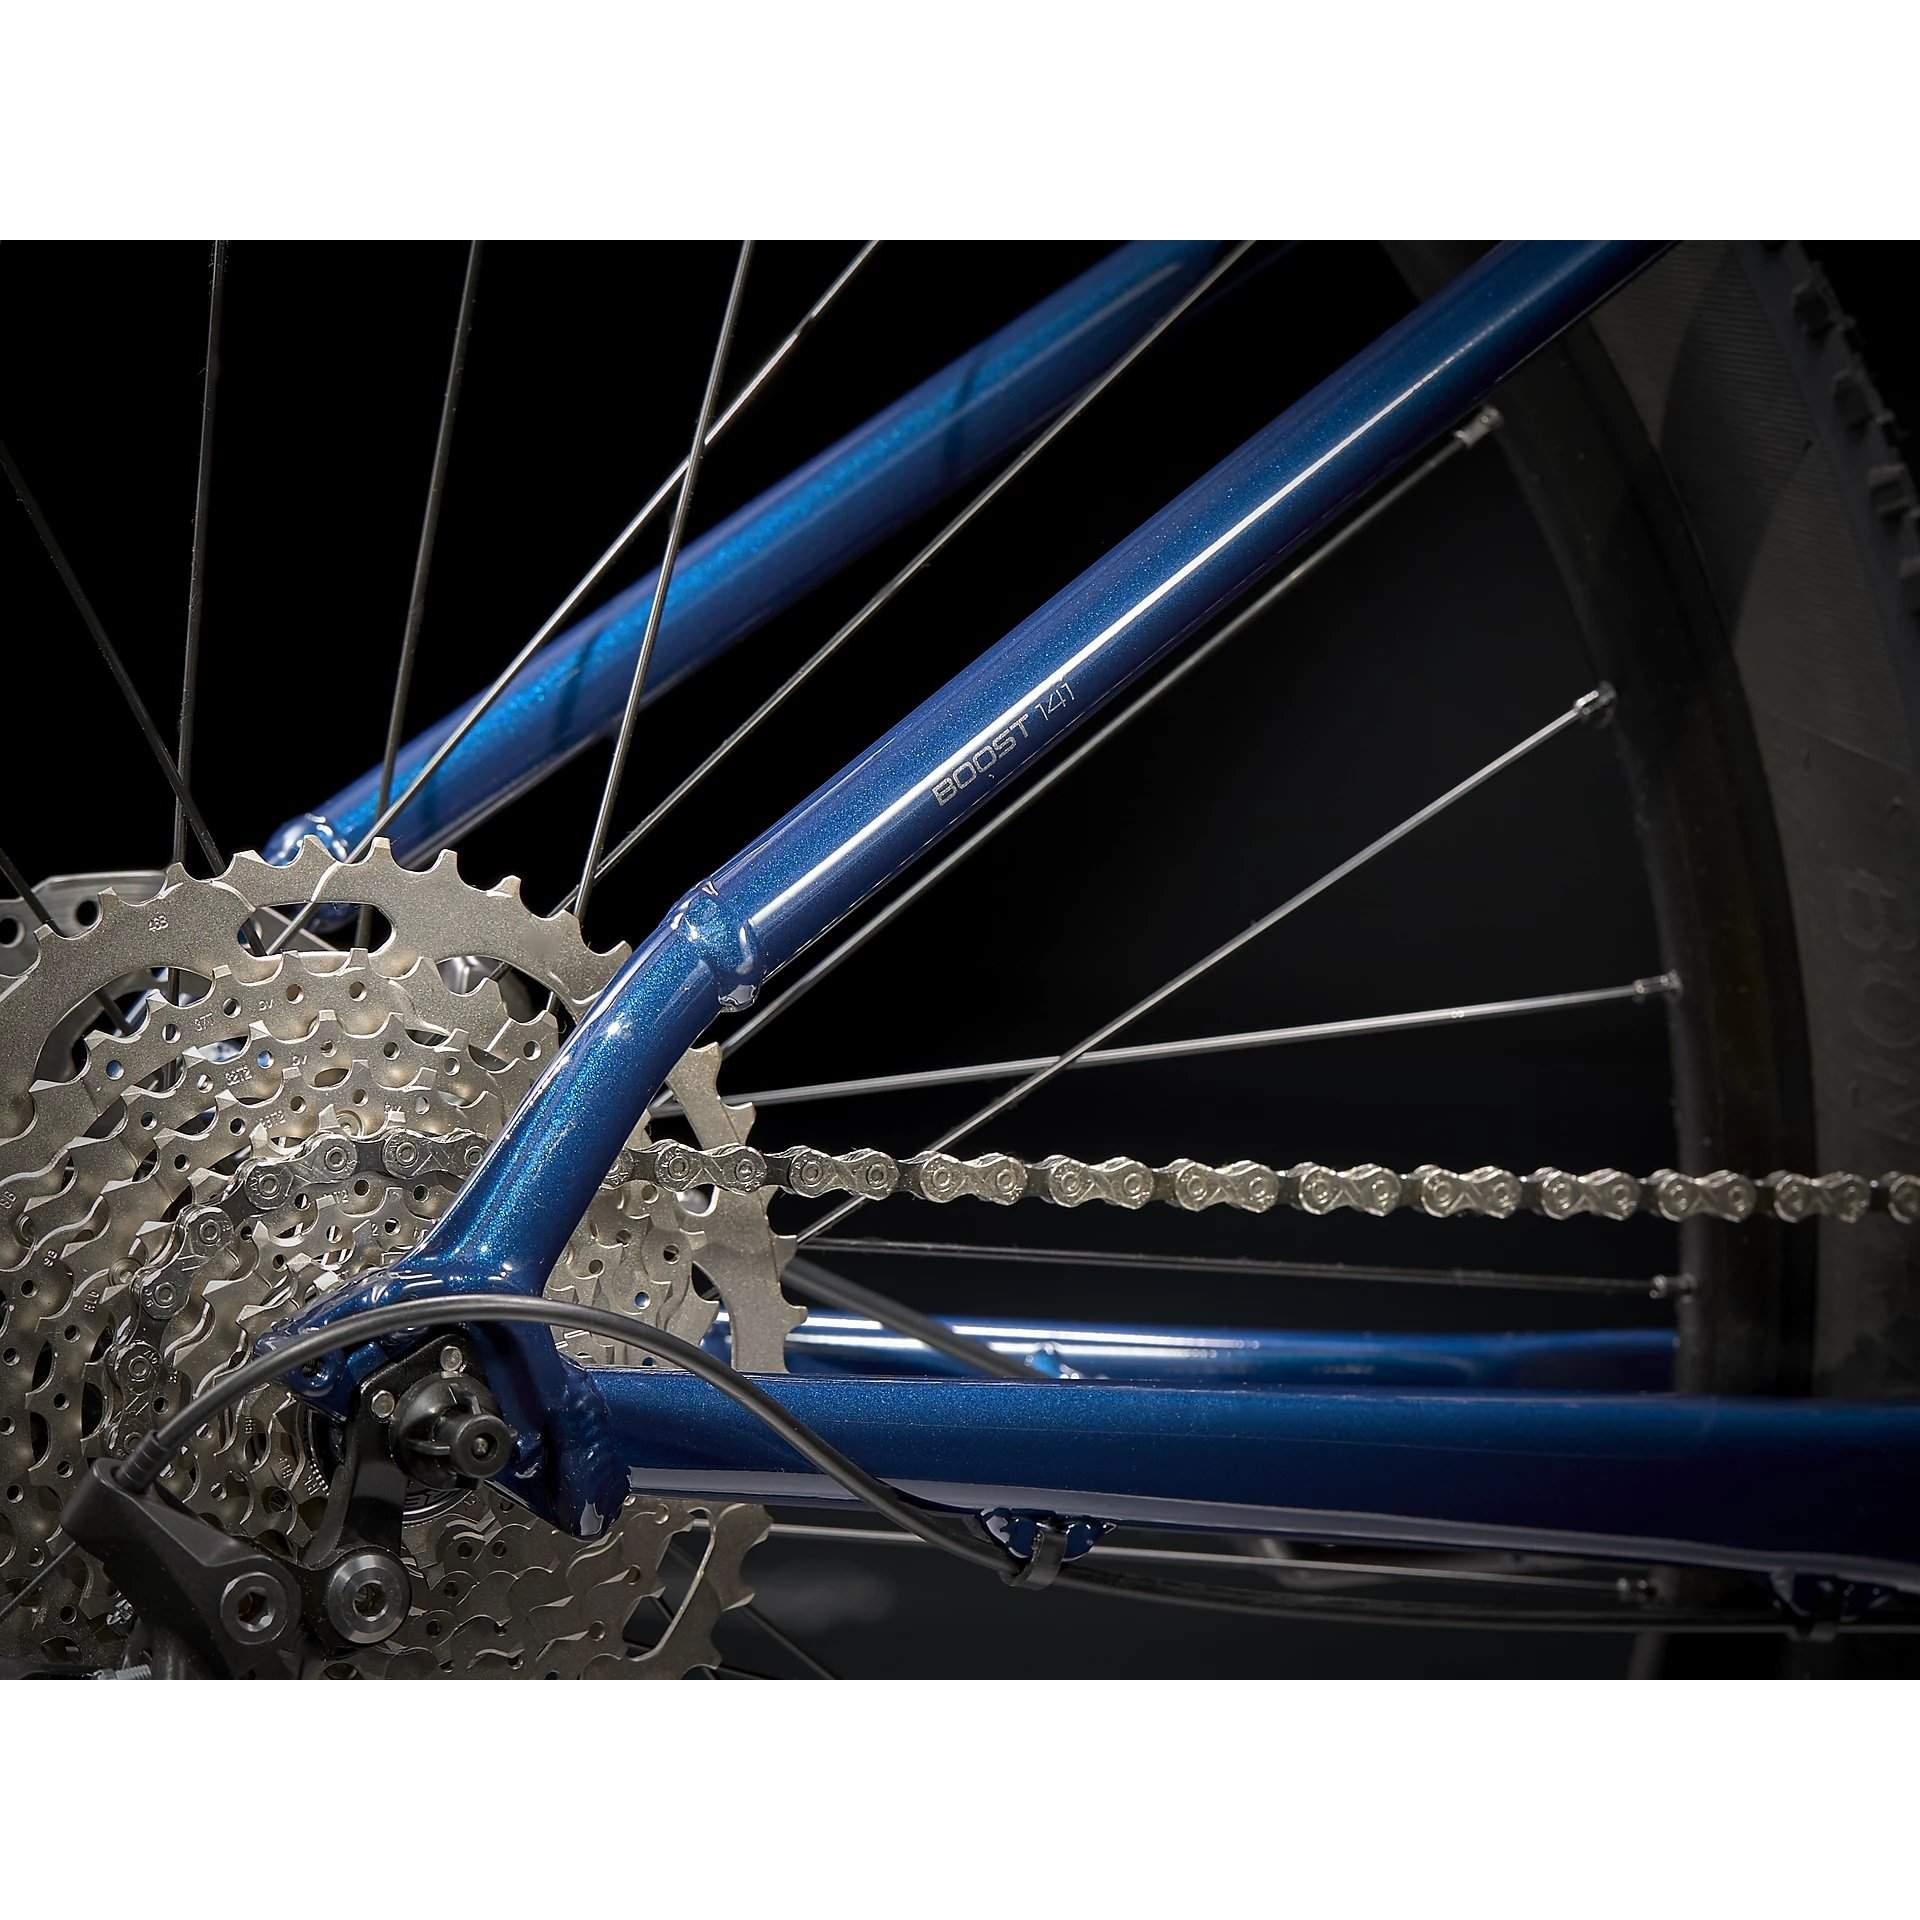 ROWER TREK X-CALIBER 7 MULSANNE BLUE|ANTHRACITE 91